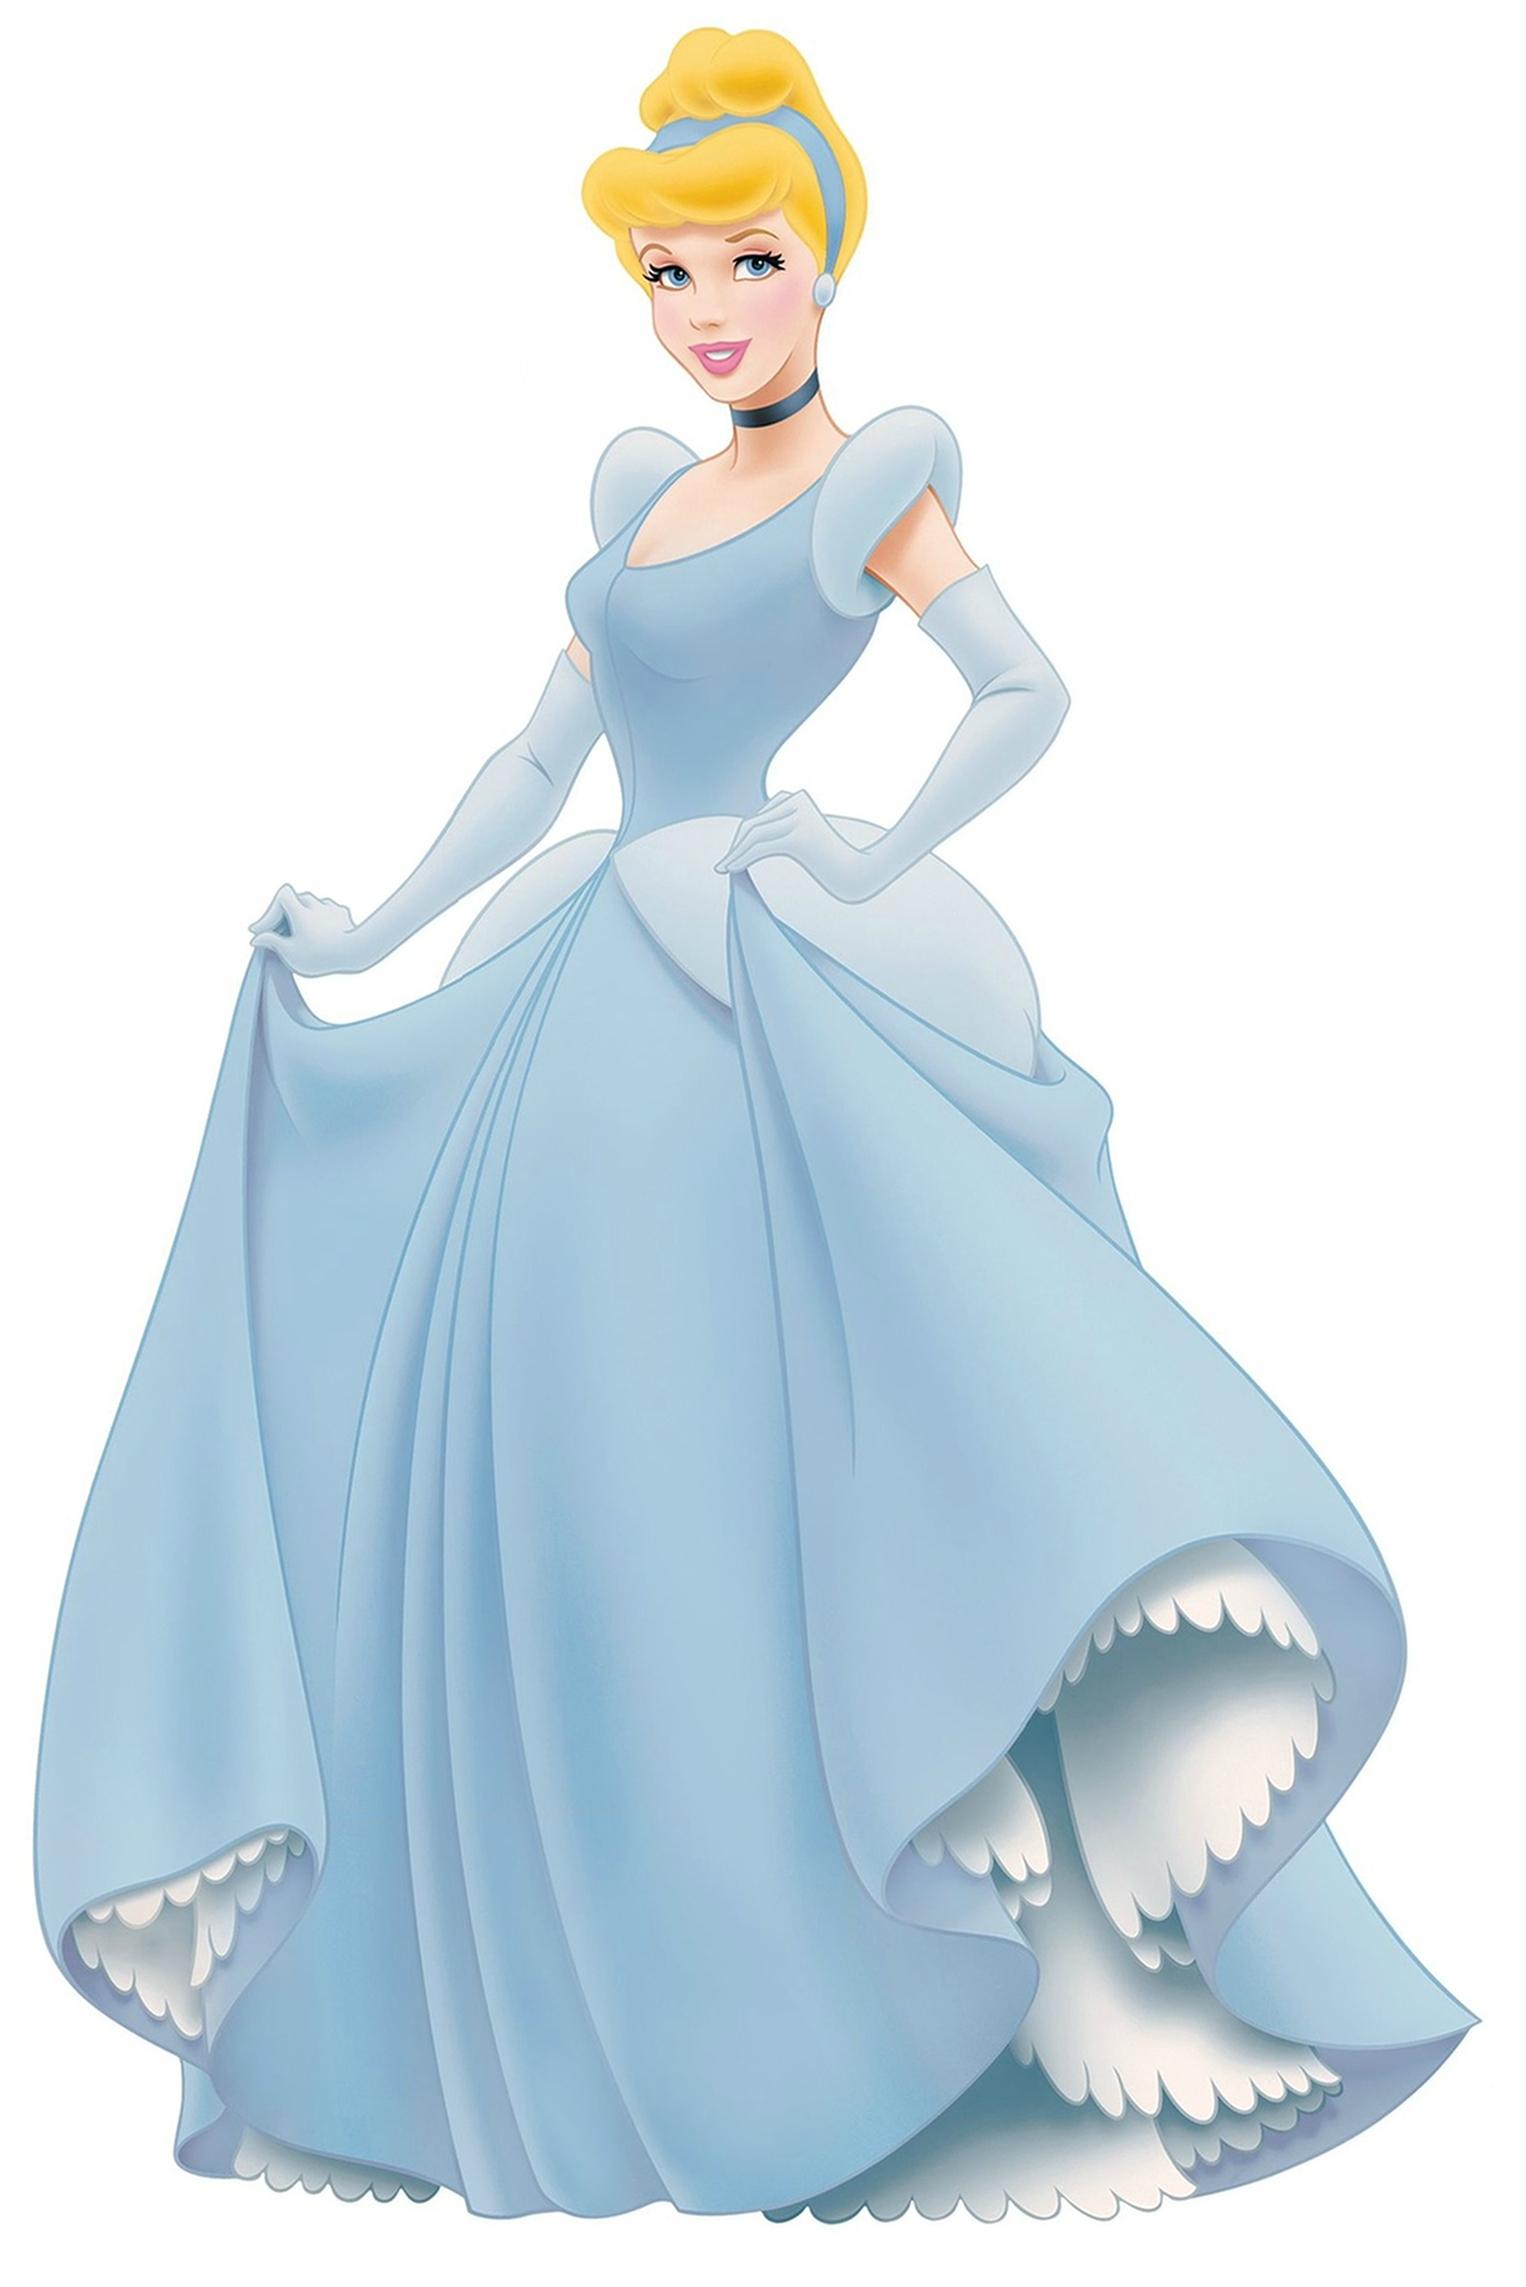 princess-cinderella-disney-princess-full-hd-image-iphone-6